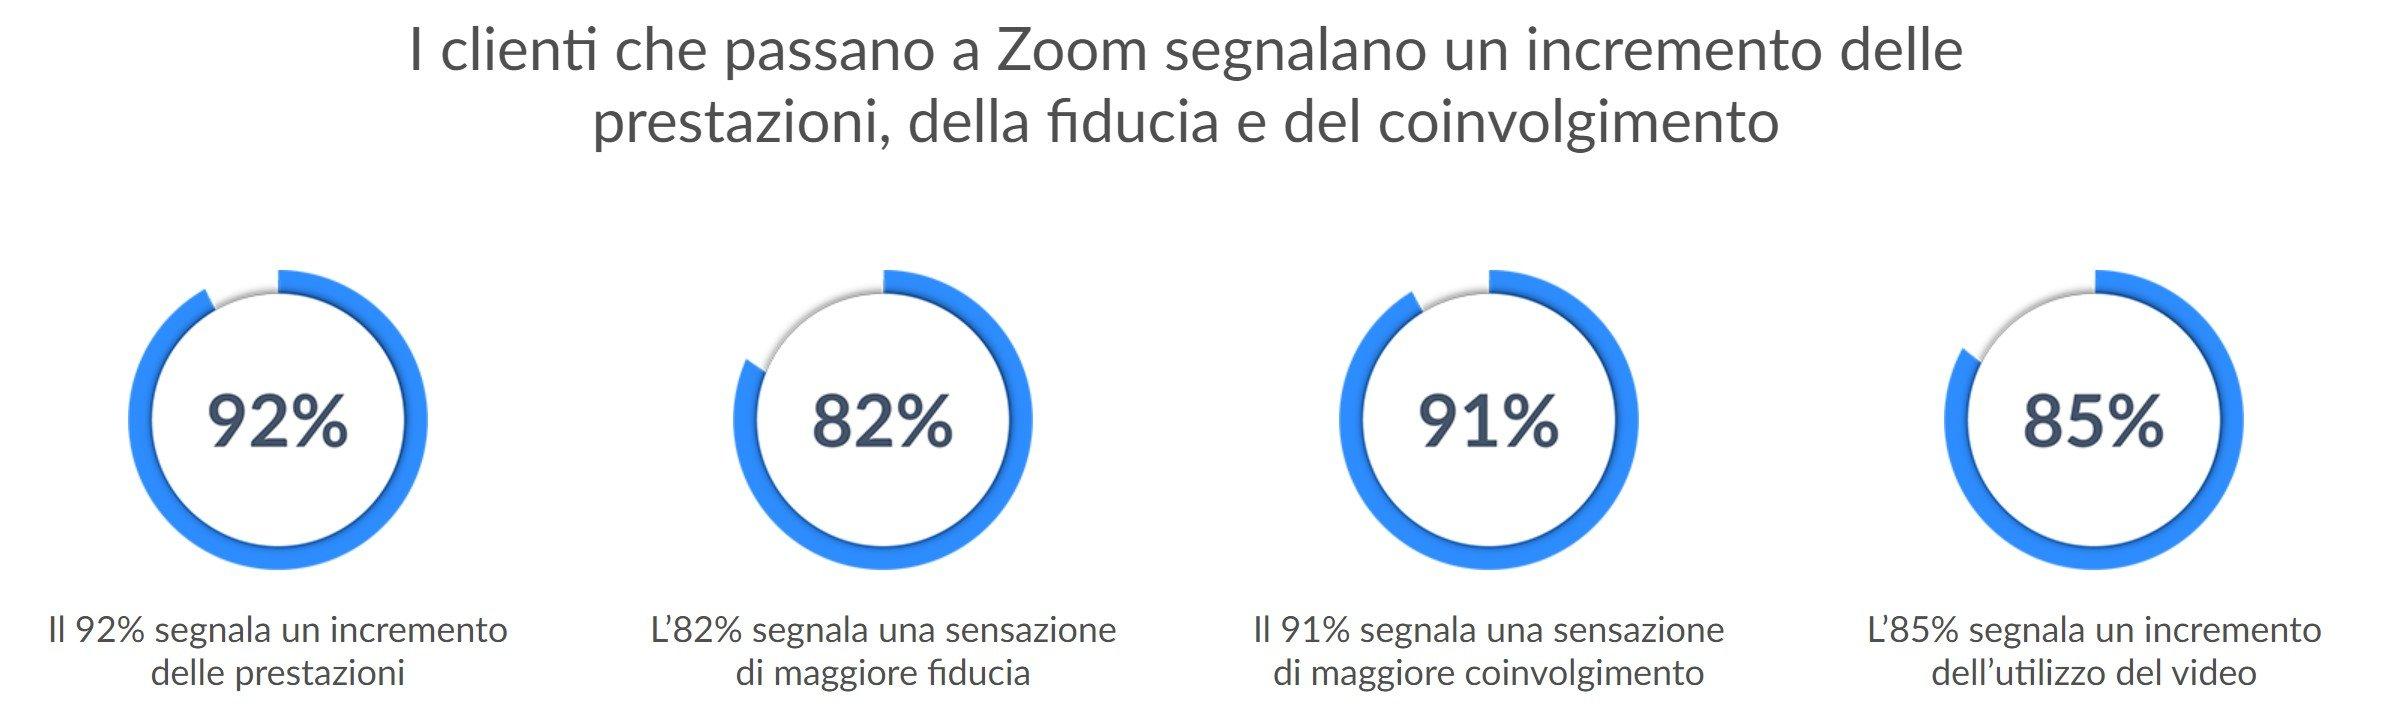 statistiche-engagement-secondo-zoom